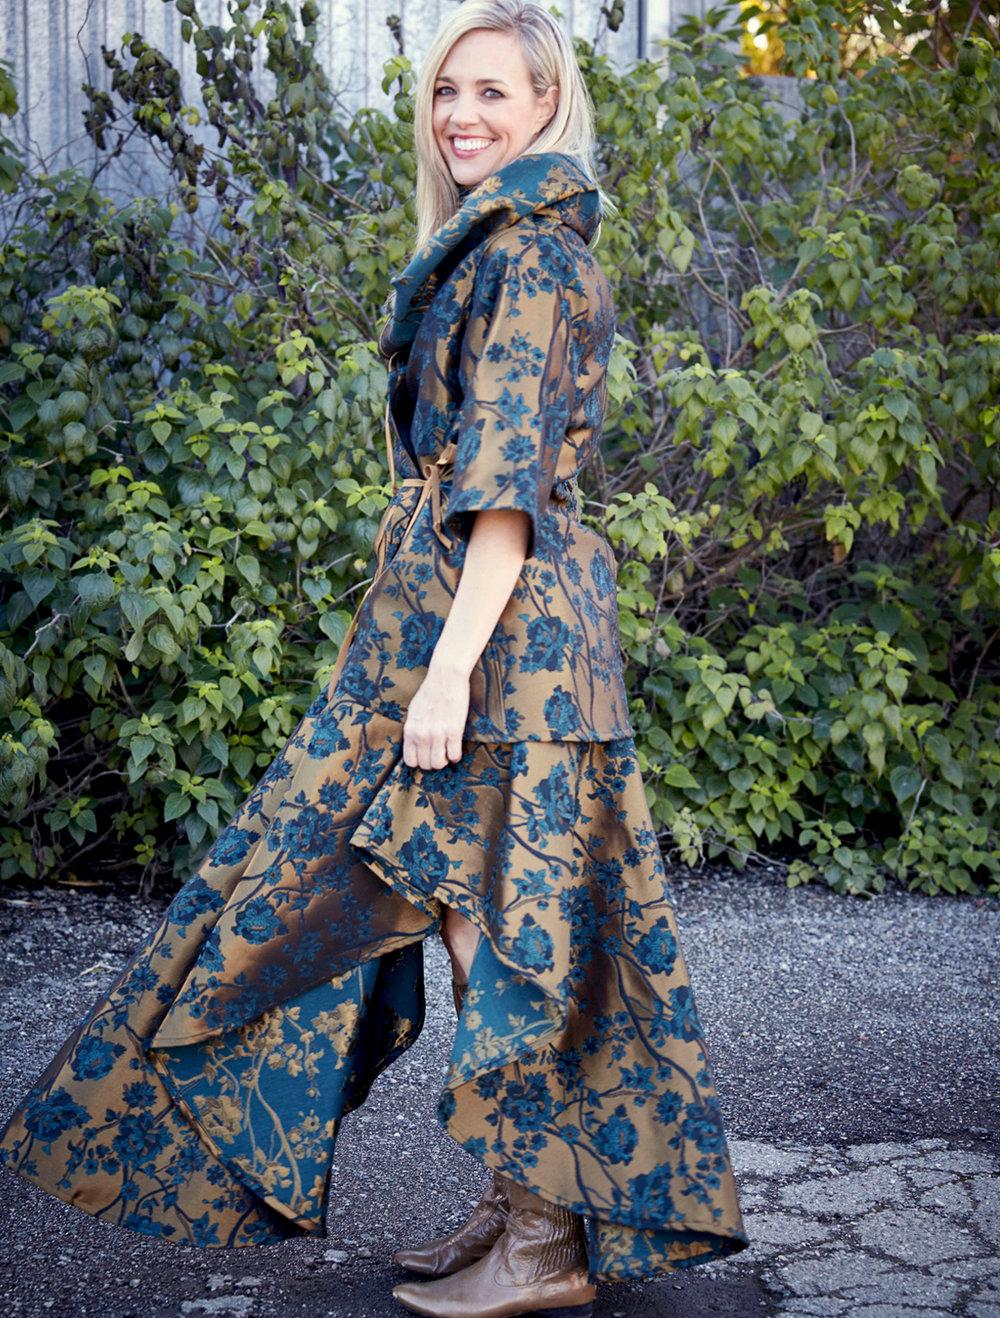 Bowie Jacket, Grange Skirt in Bronze Broccatello Fiori